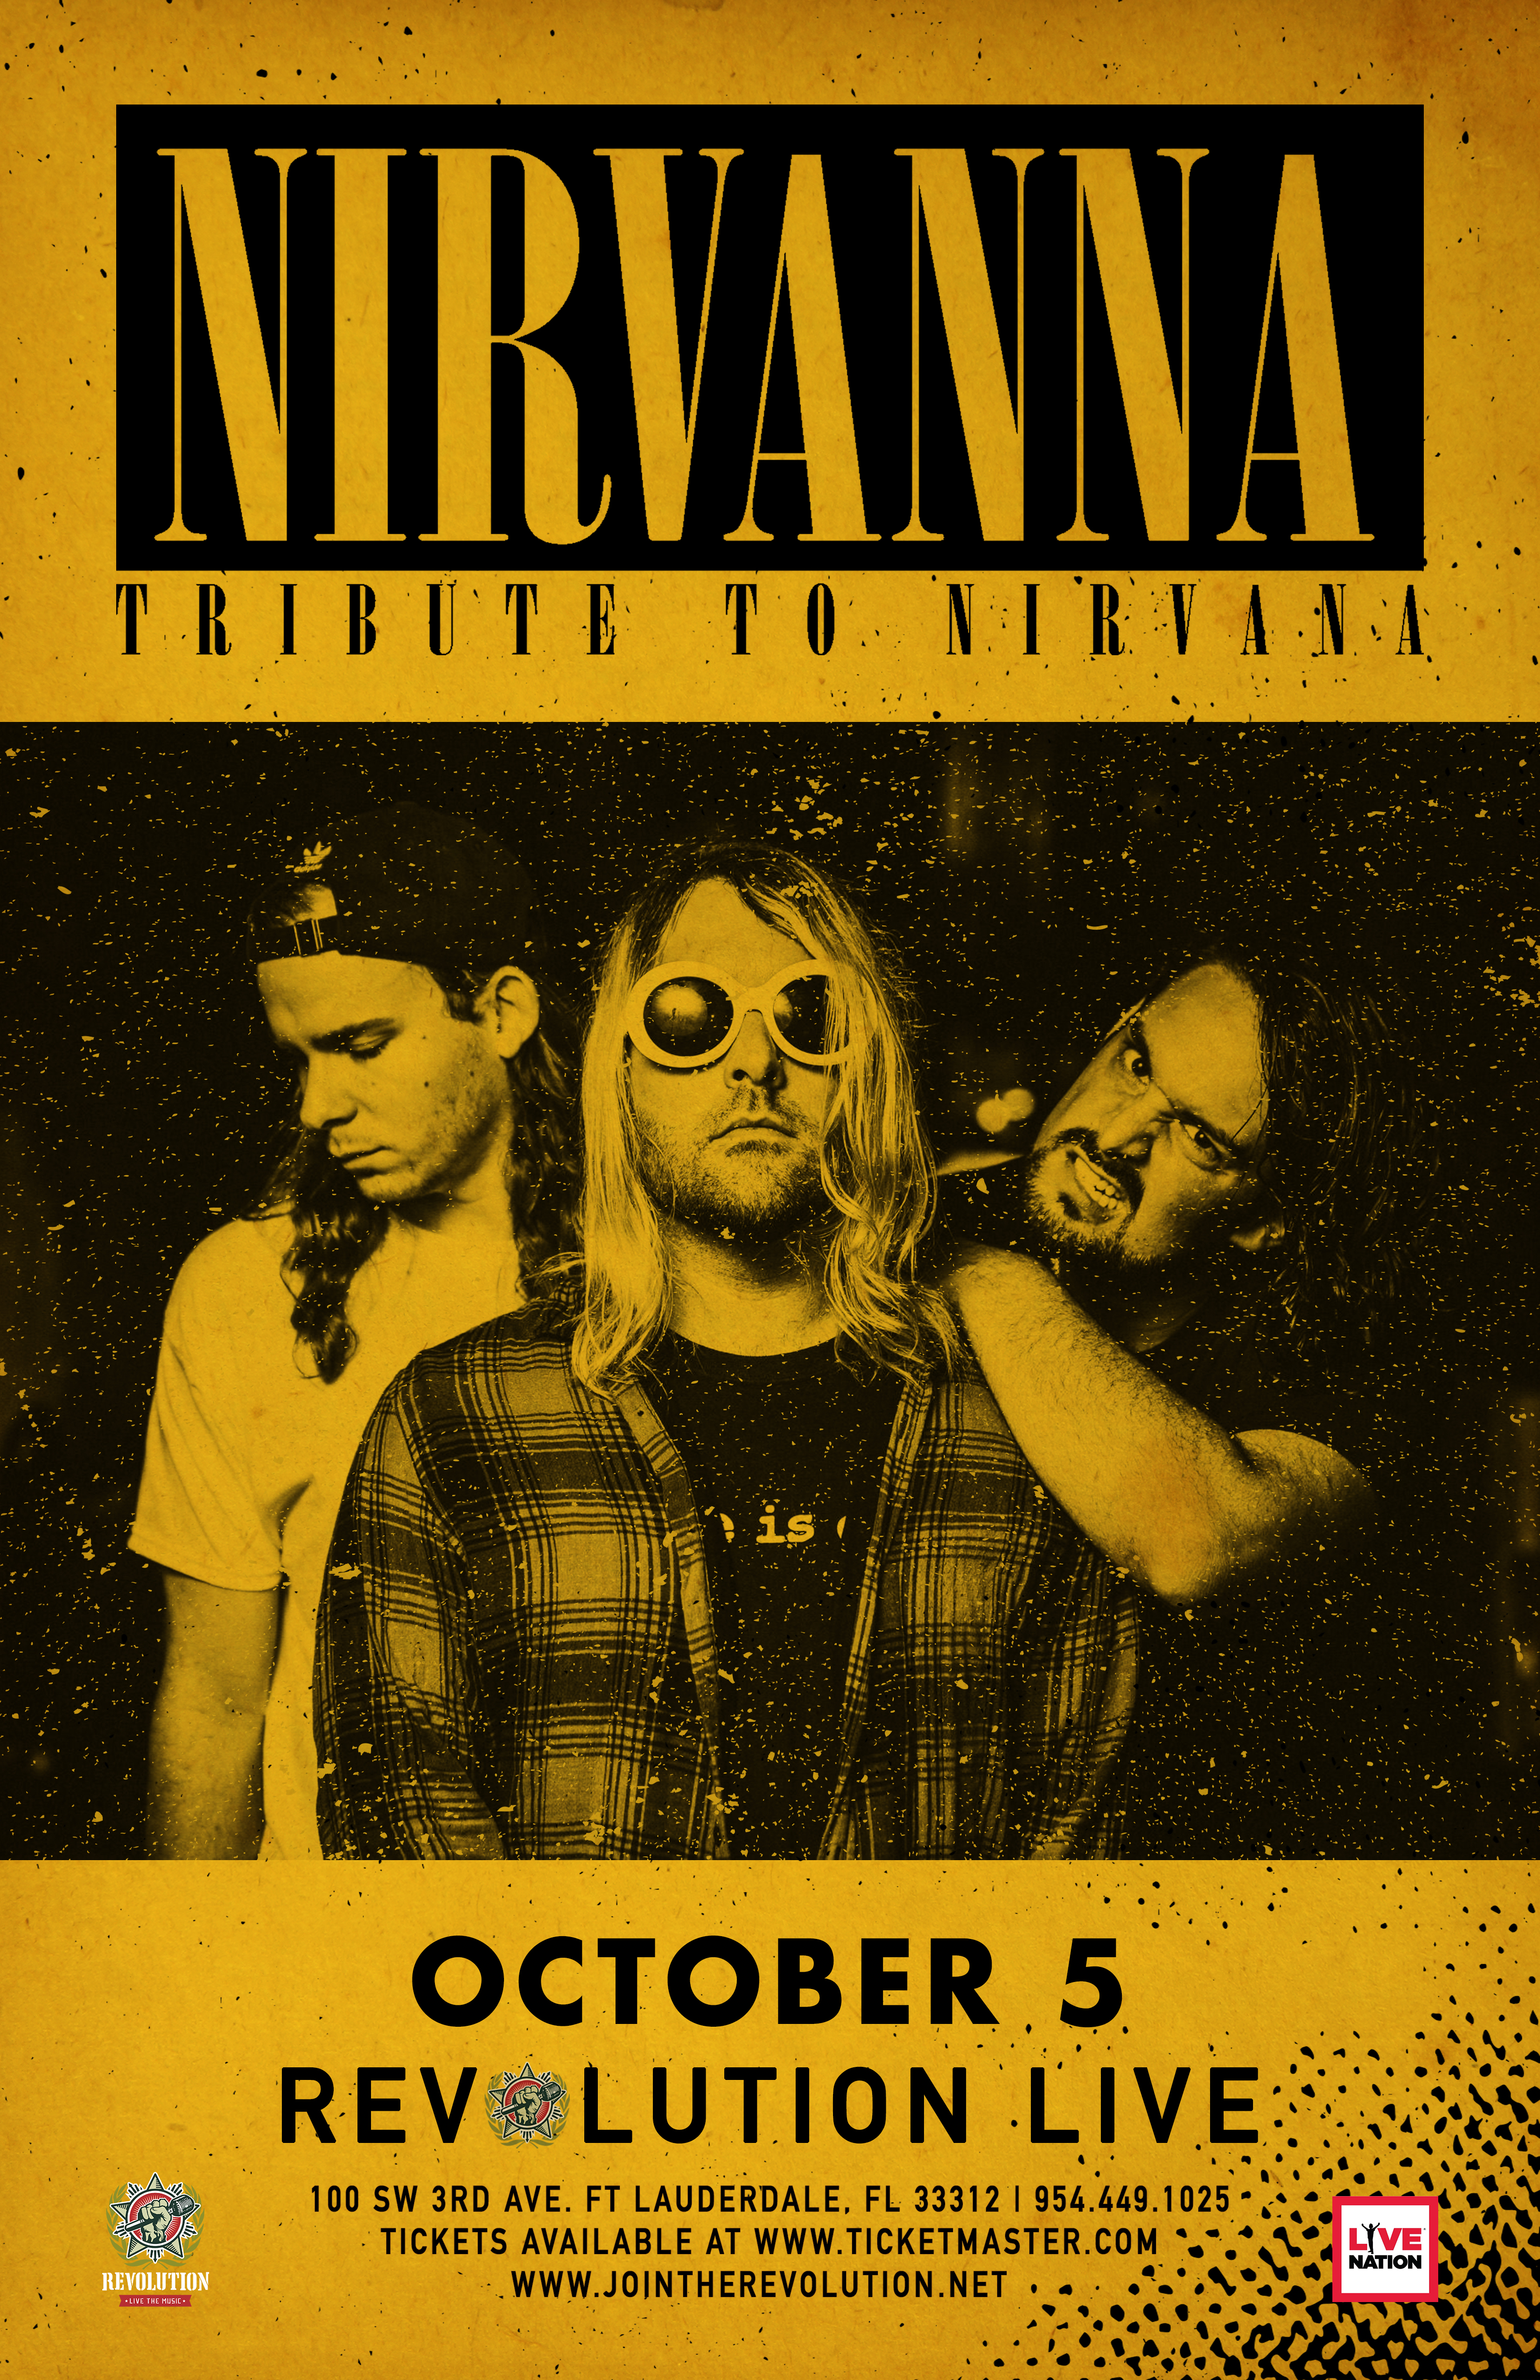 Nirvanna - Tribute to Nirvana